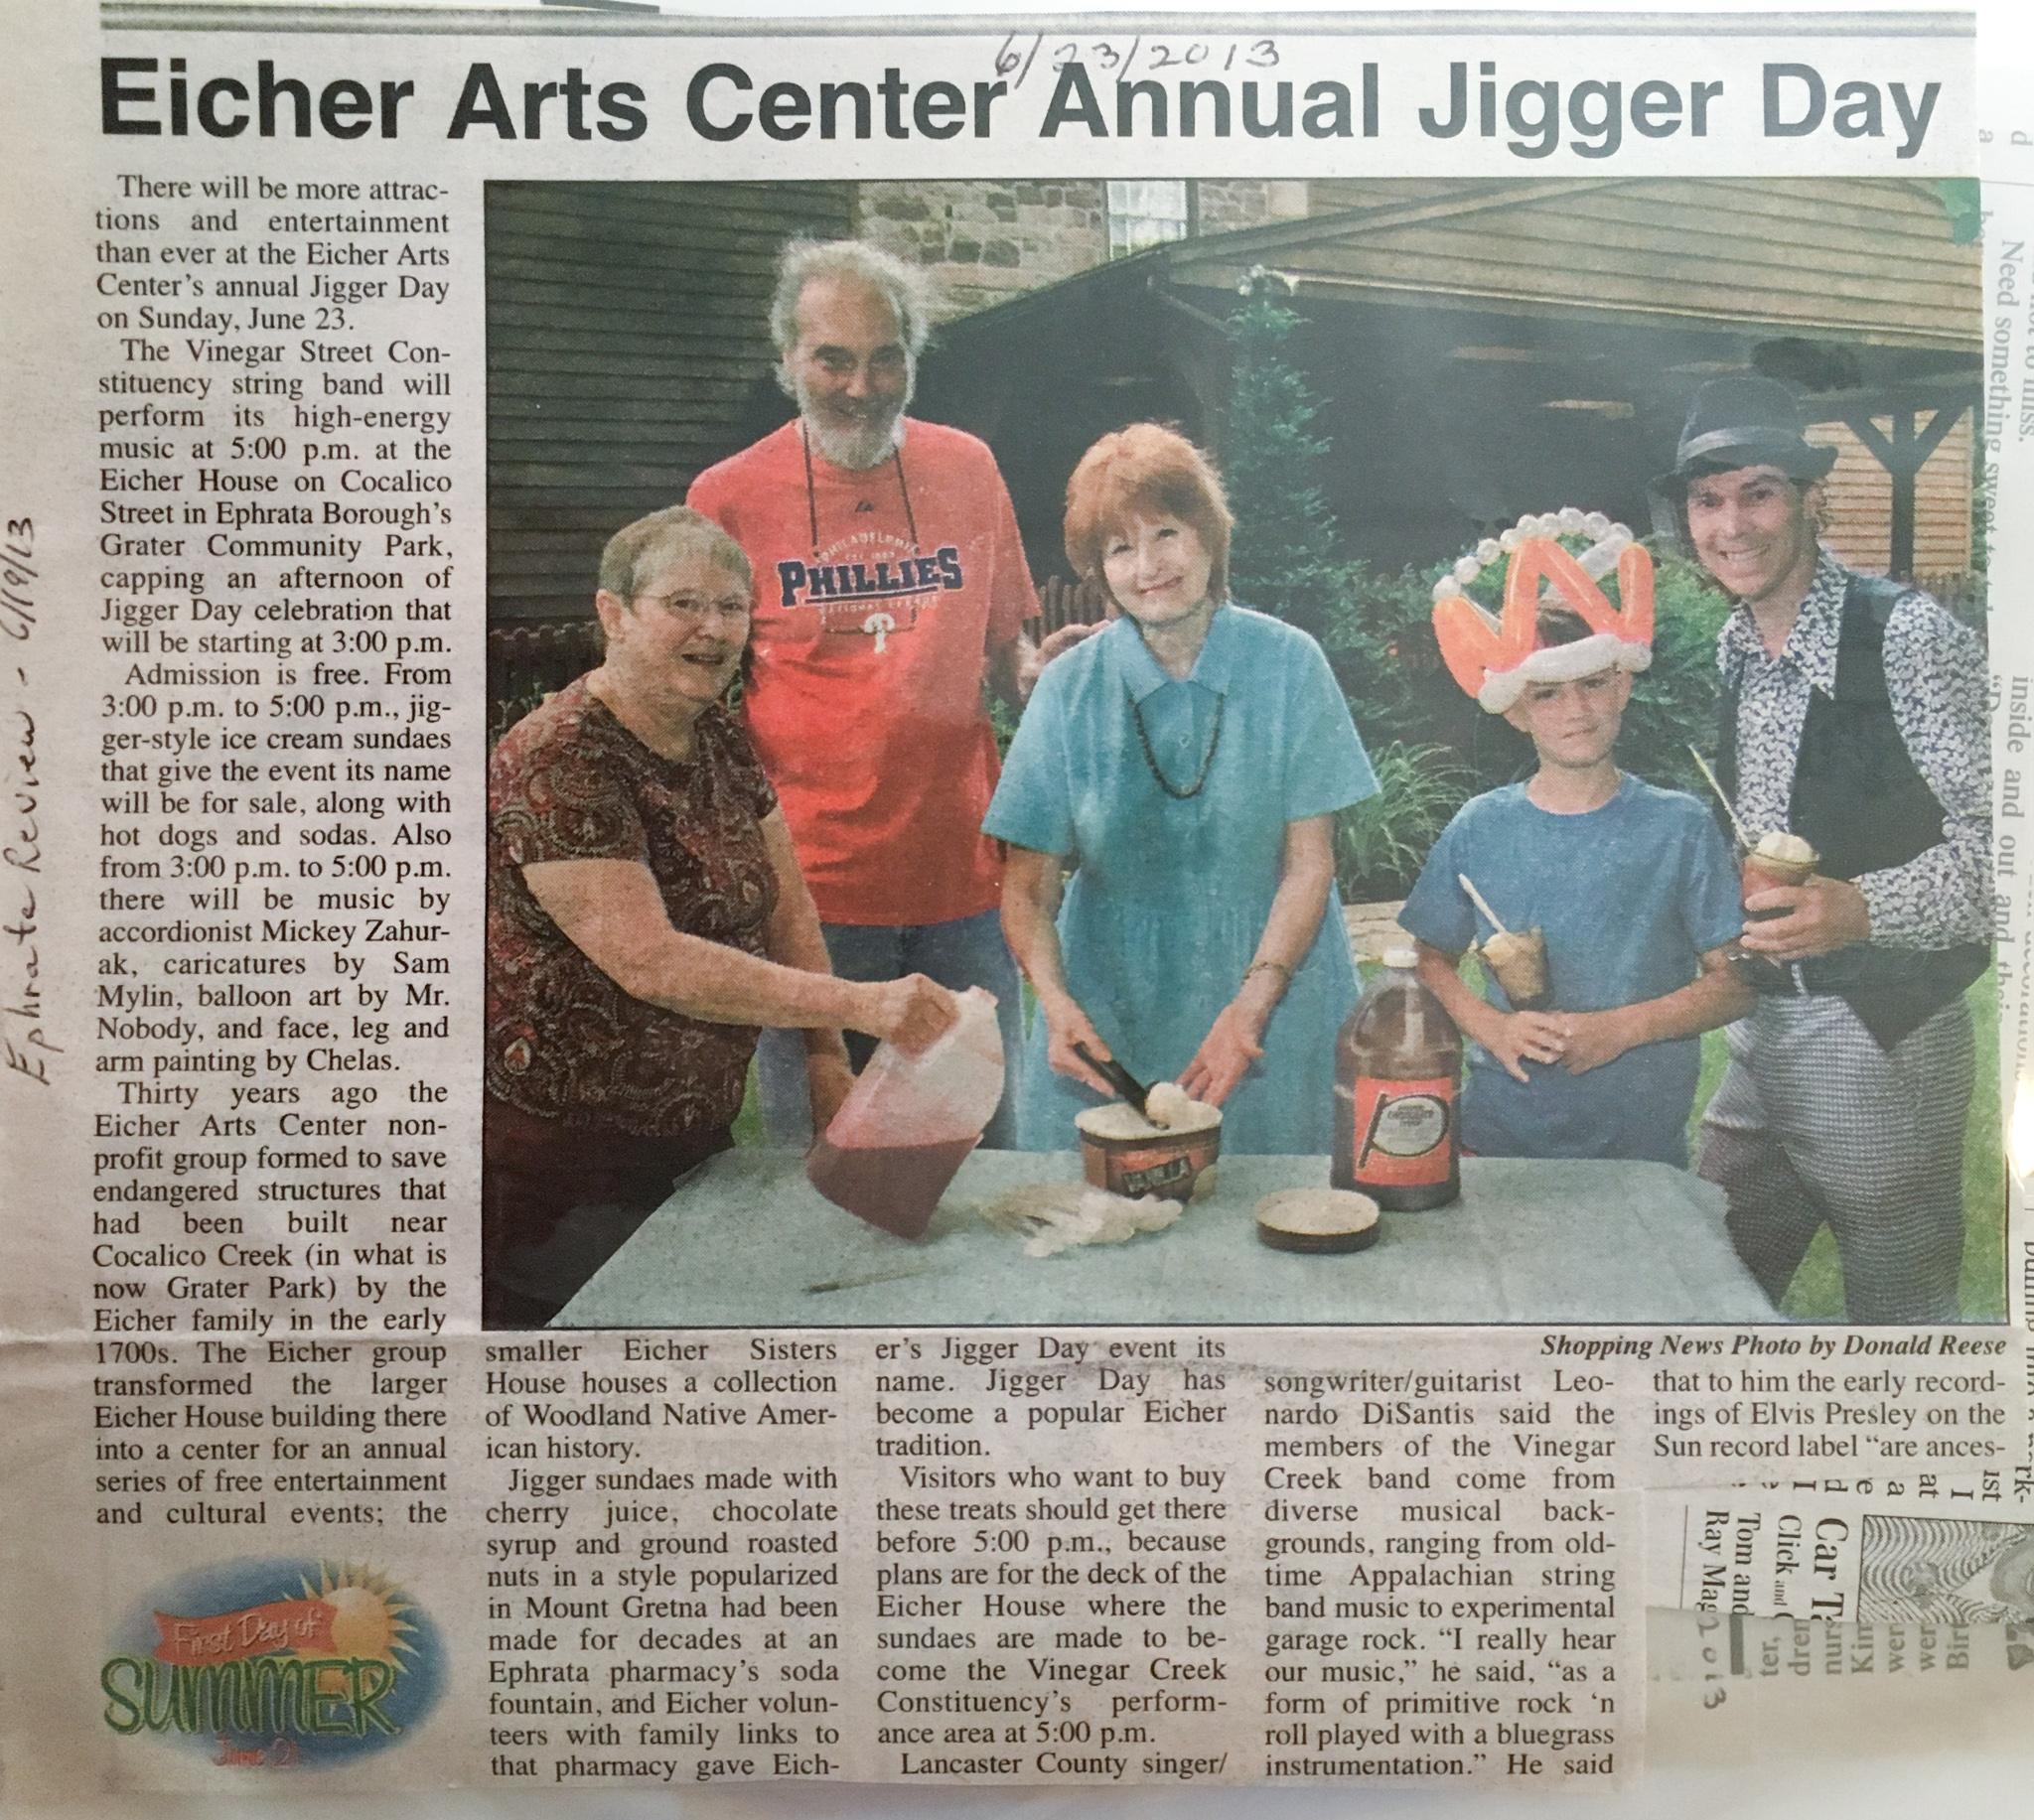 Annual Jigger Day